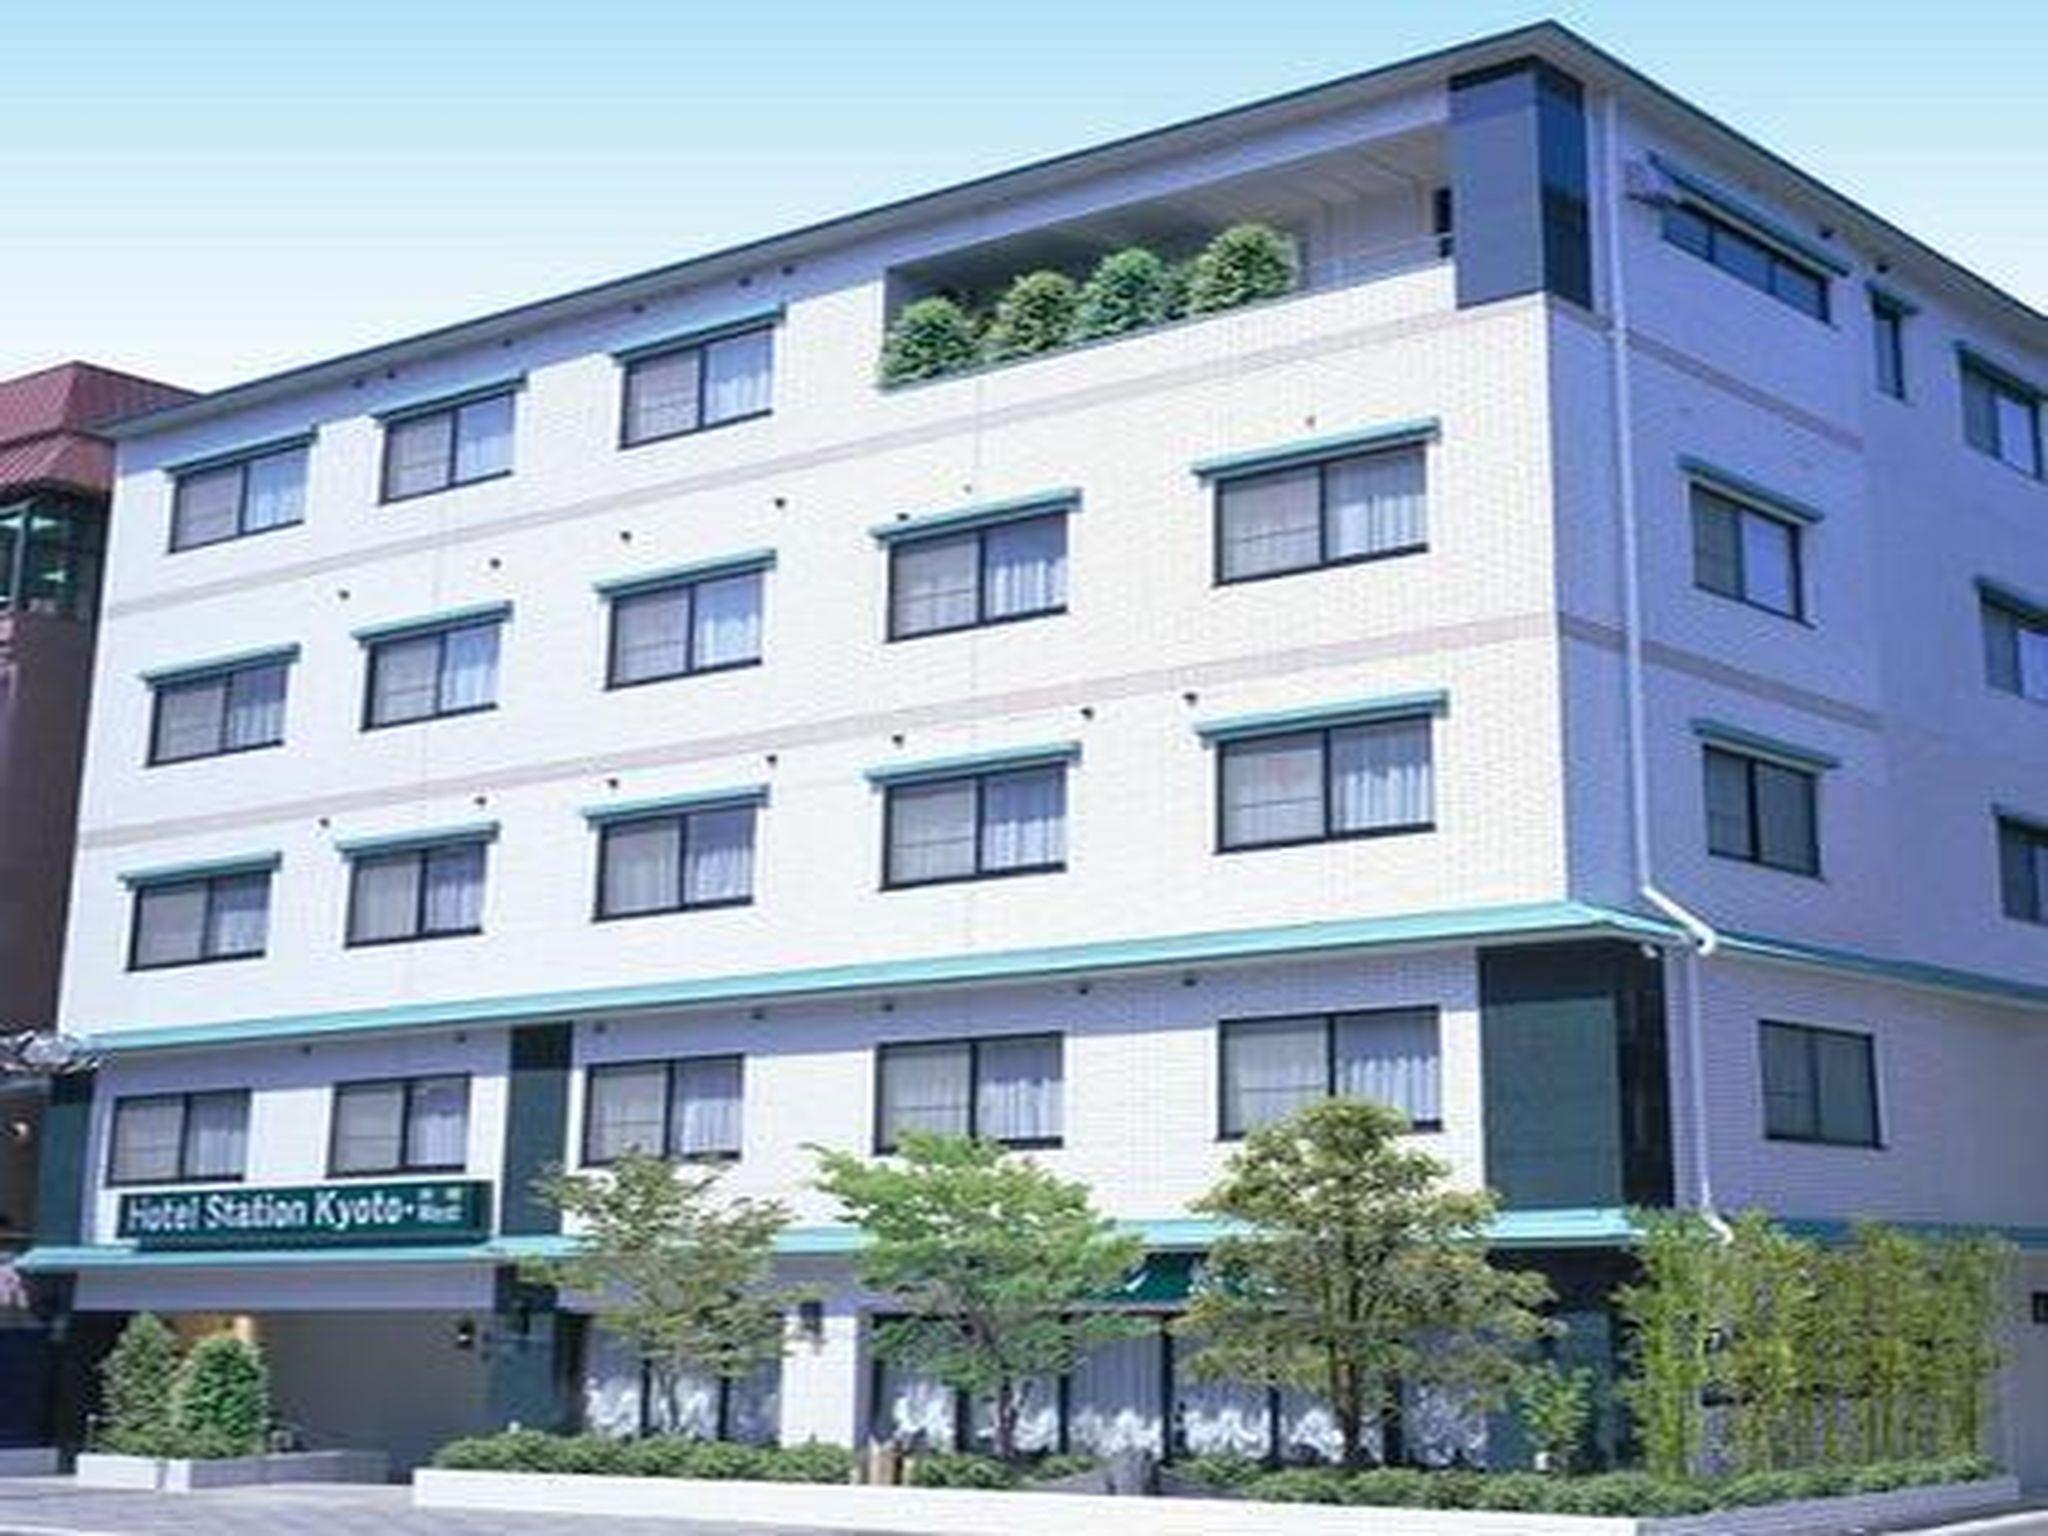 Hotel Station Kyoto West